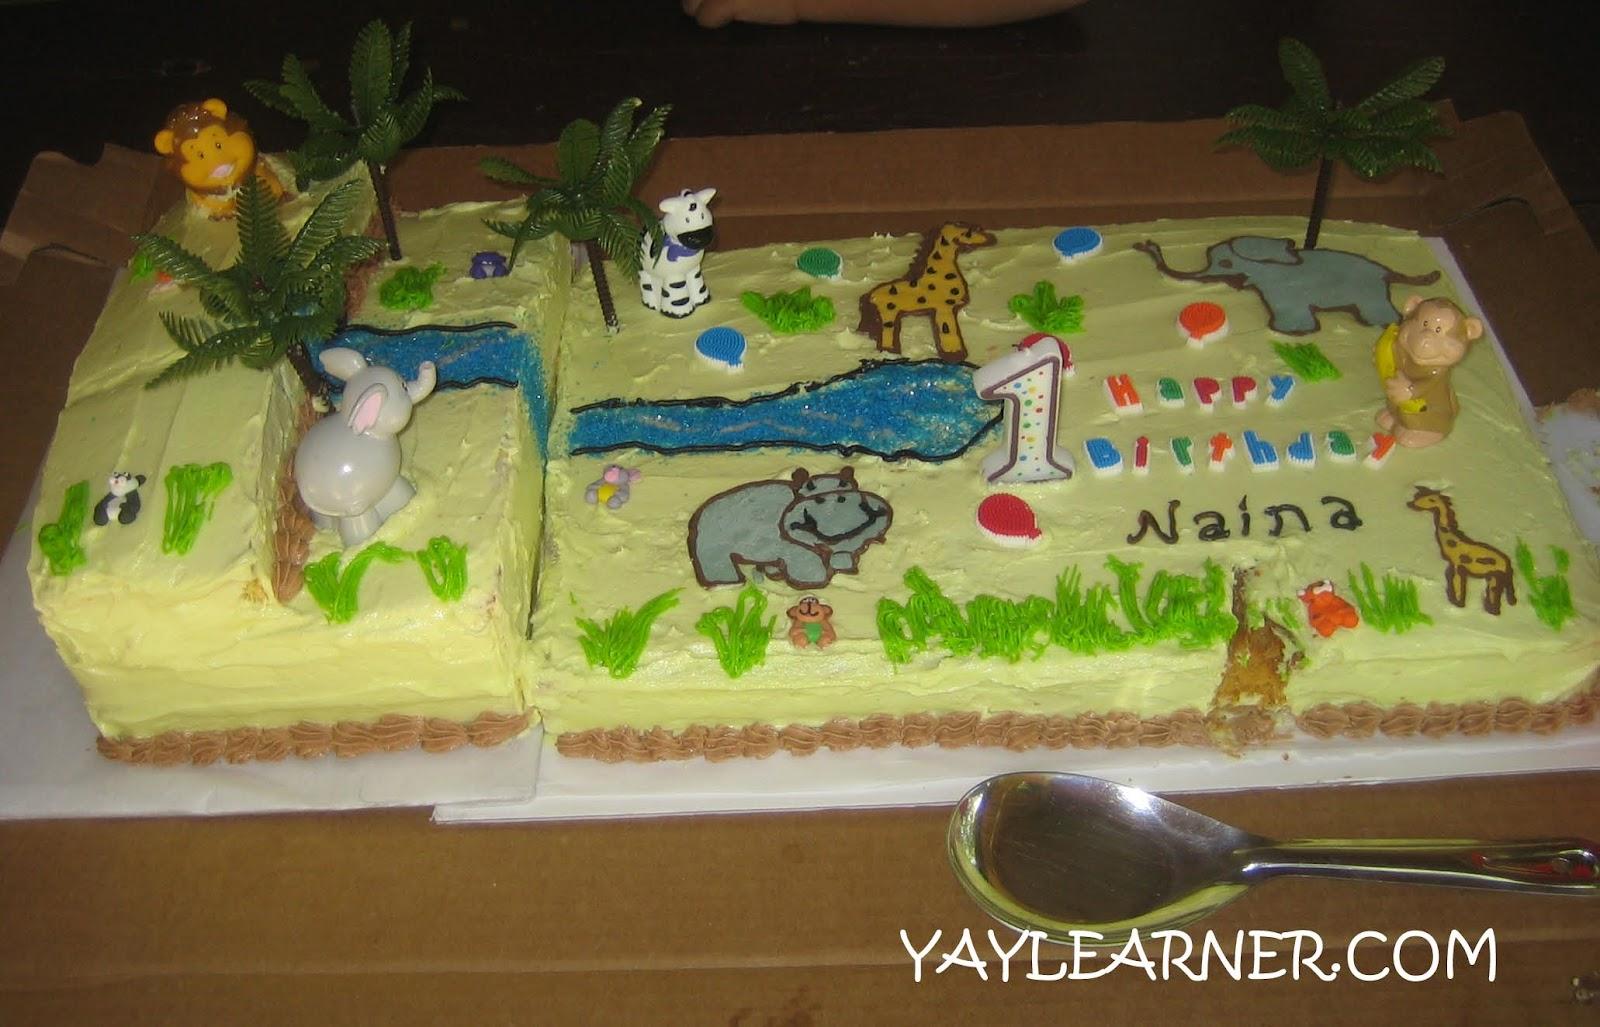 Rectangle Birthday Cakes With Flowers Cake layout - one rectangular